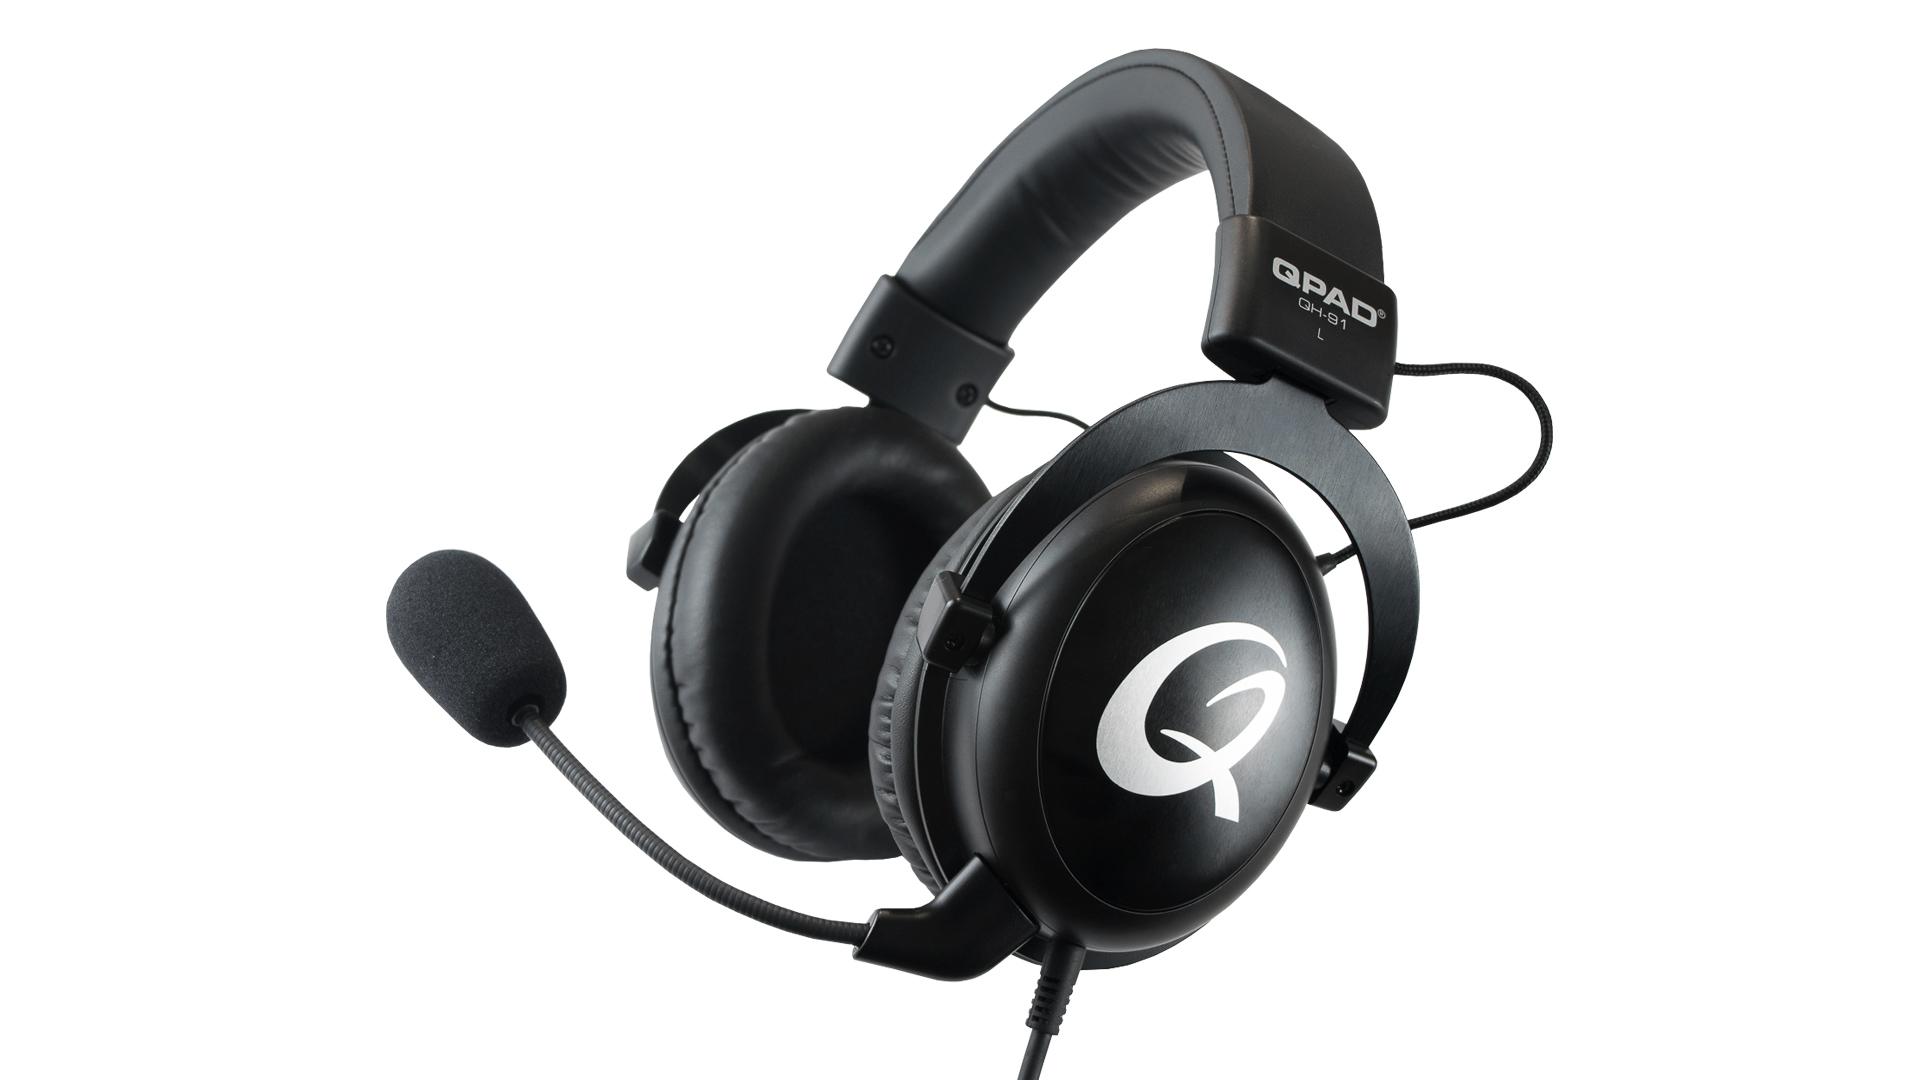 QPAD QH-91 - Headset - Kabelgebunden - 3,5 mm Klinke - Binaural